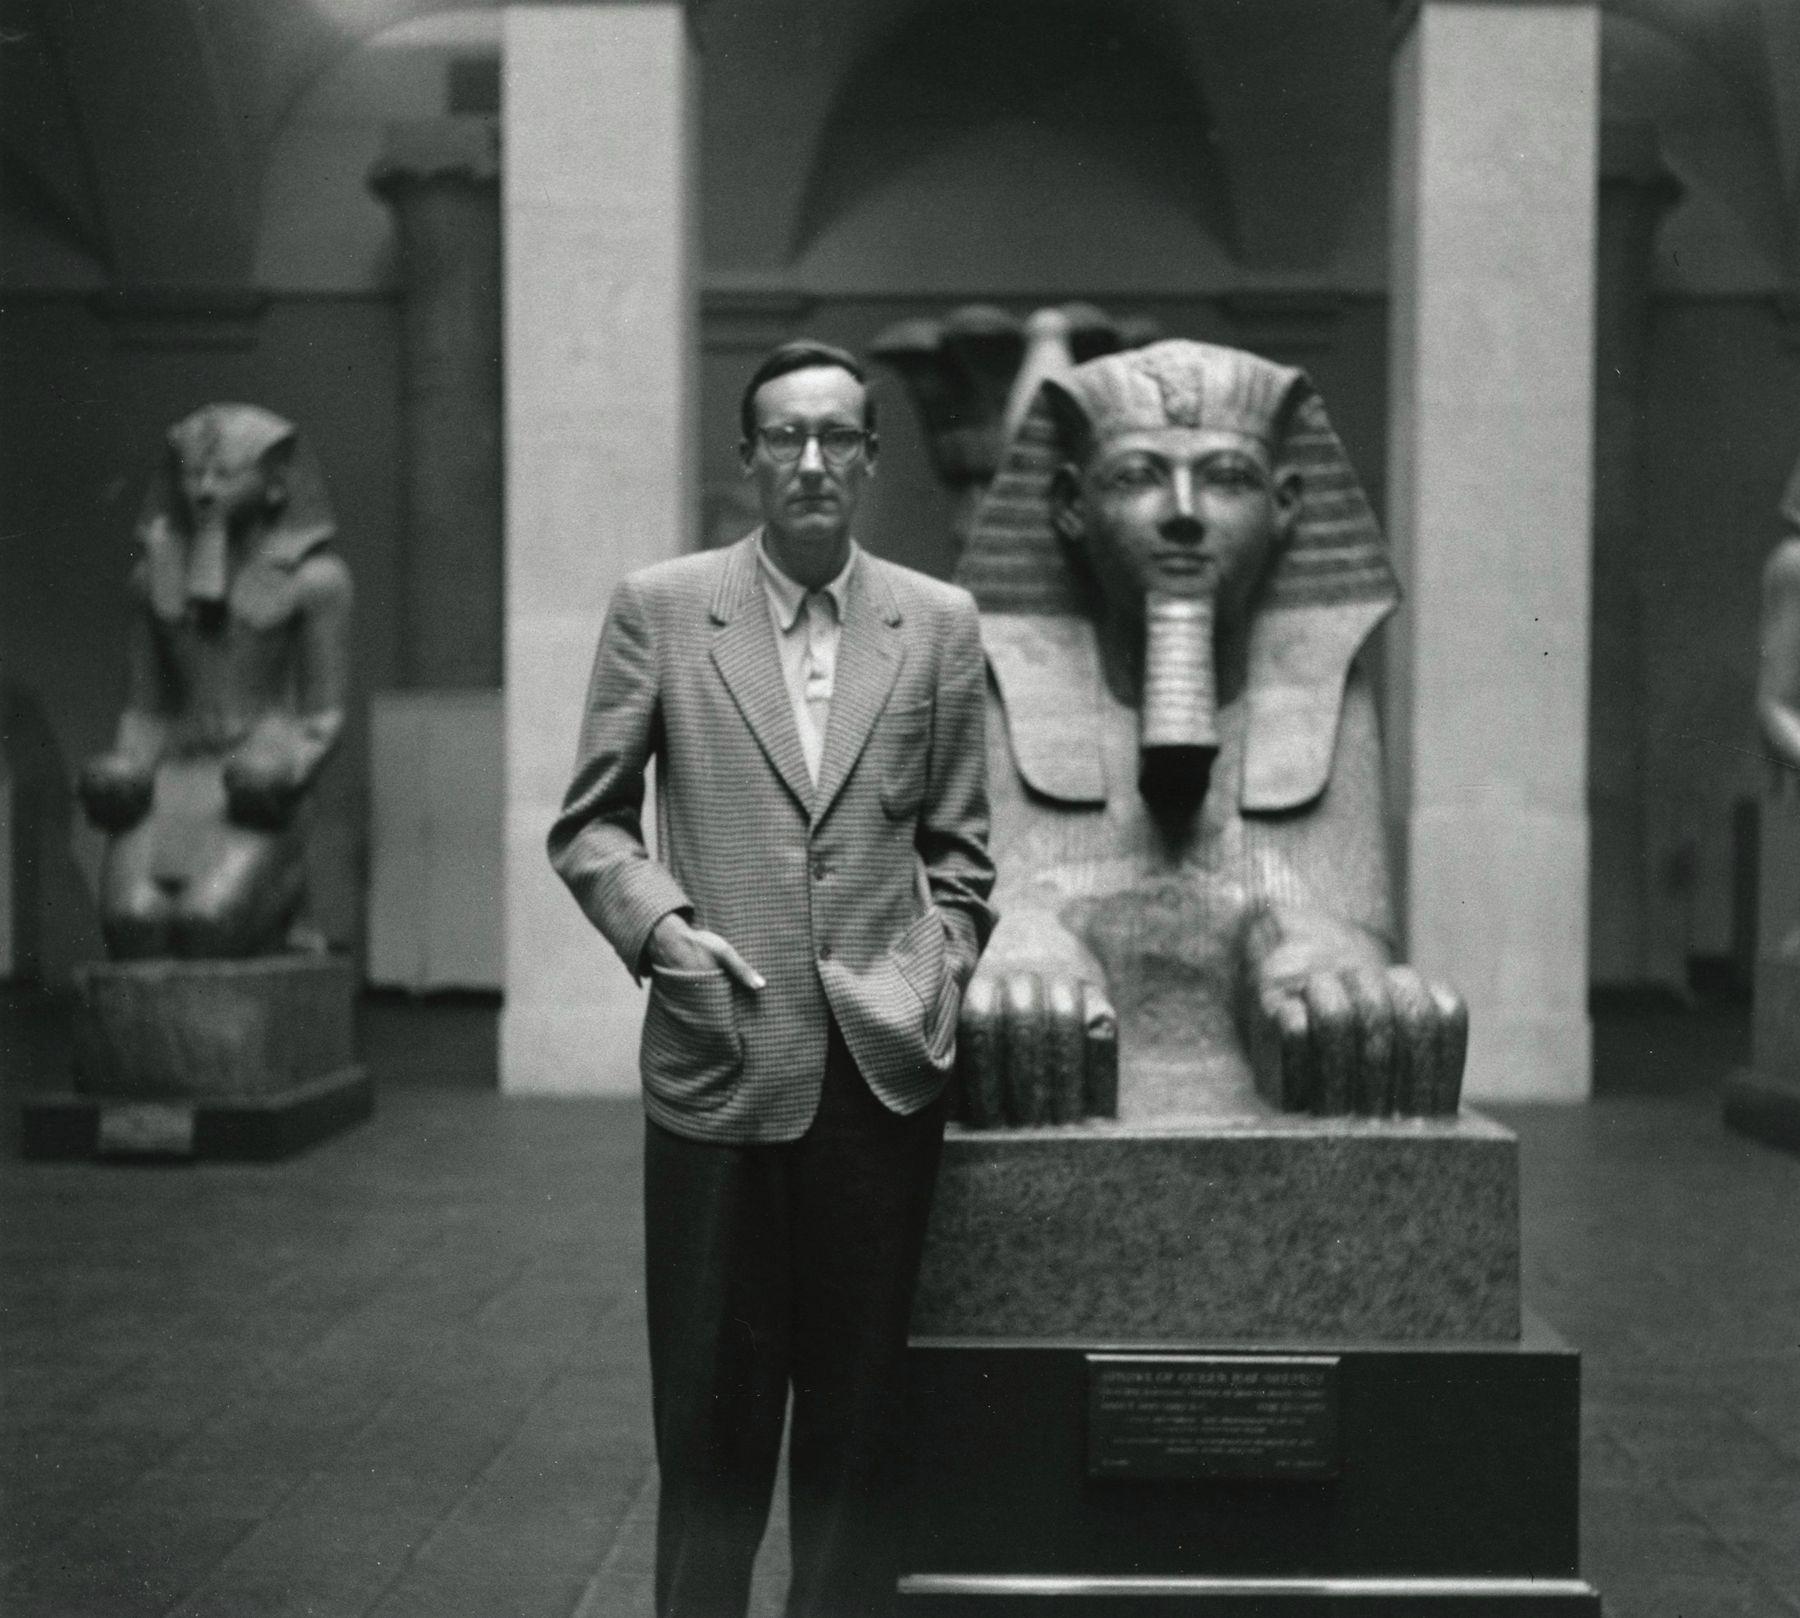 Allen Ginsberg - William S. Burroughs with Sphynx, Metropolitan Museum of Art, New York, 1953 - Howard Greenberg Gallery